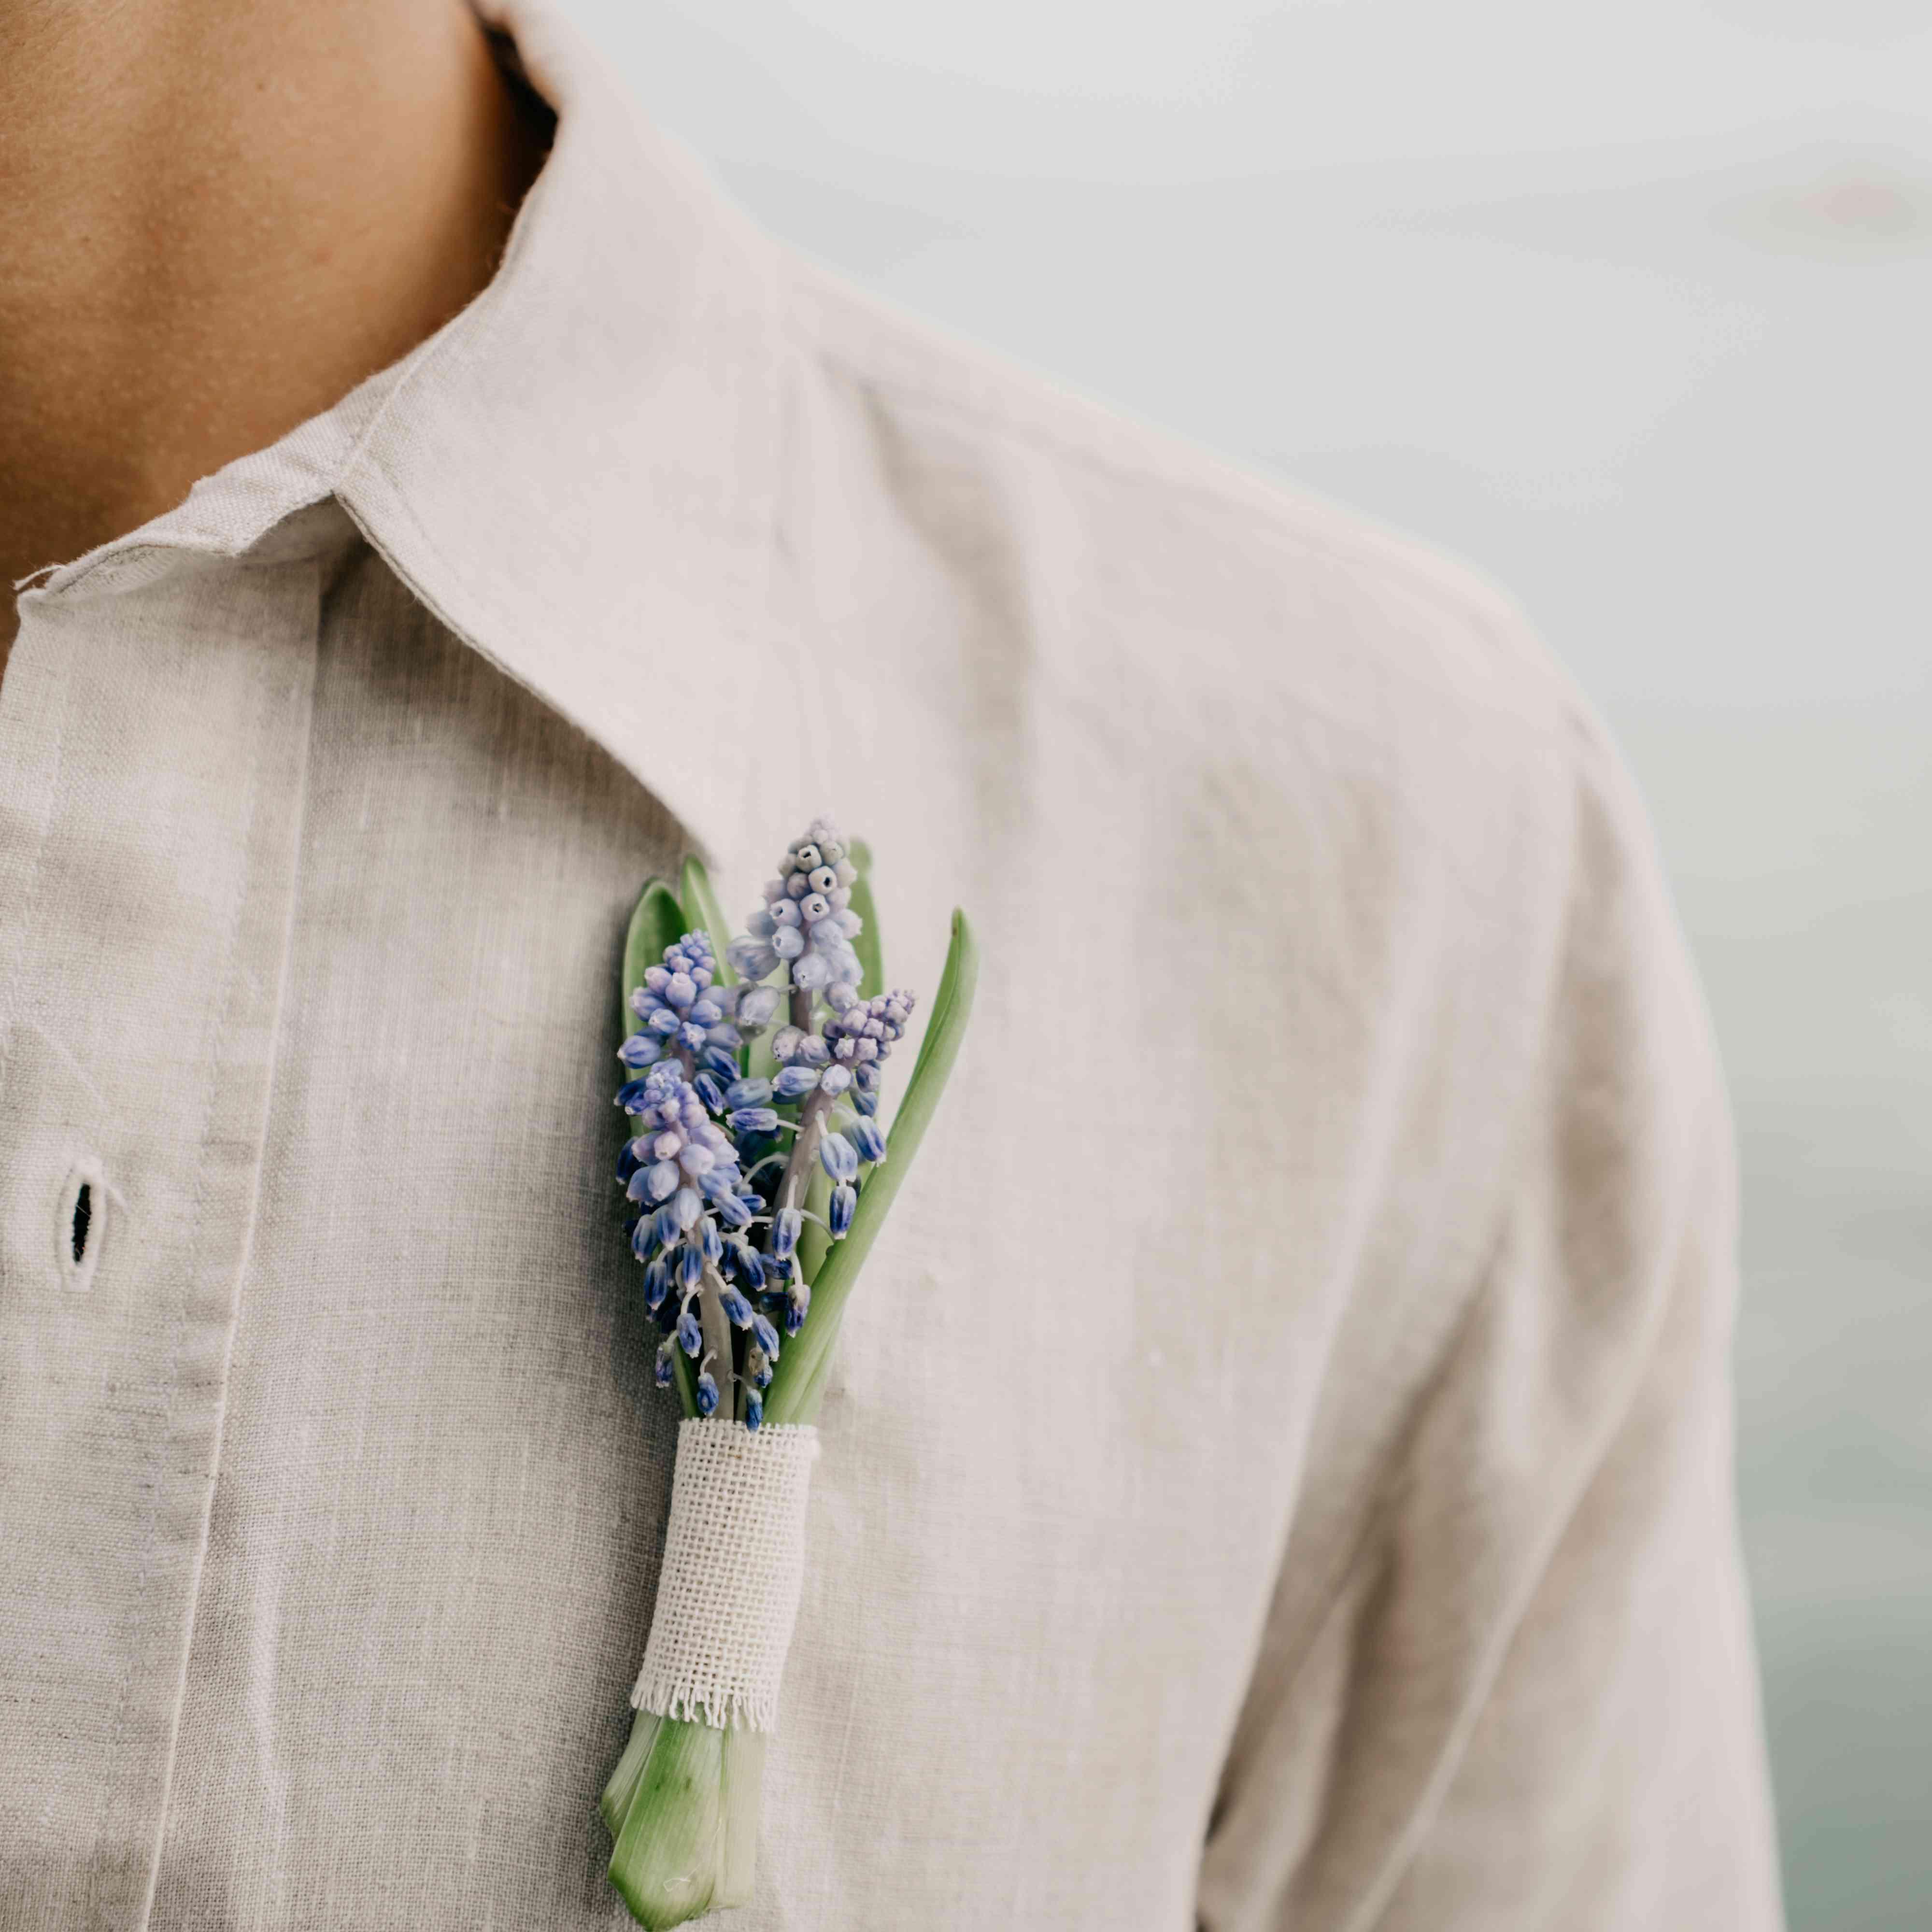 Blue grape hyacinth bouttoniere